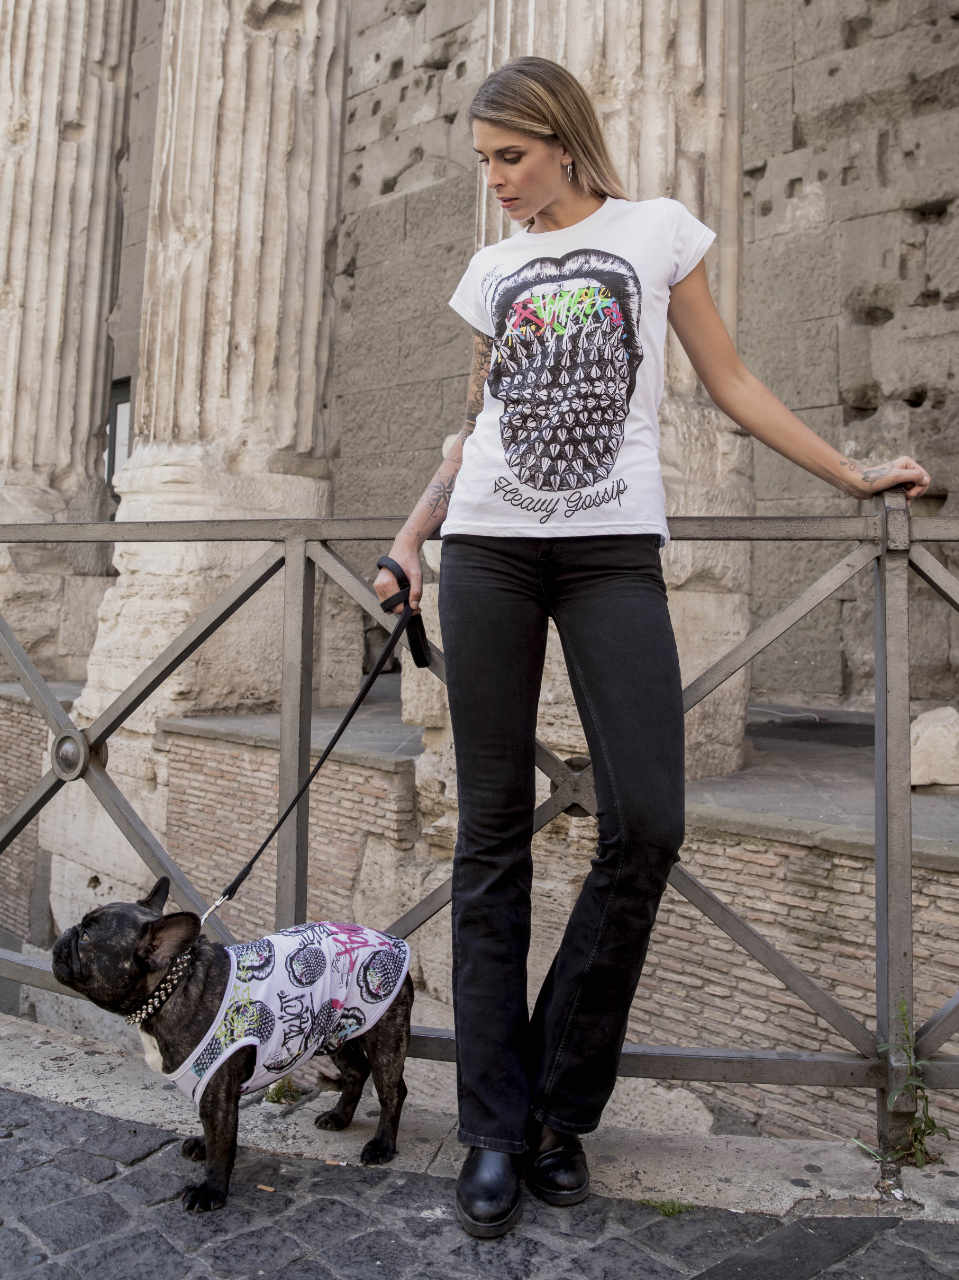 Urban Style T-Shirt Streetwear - Home 5 Mobile